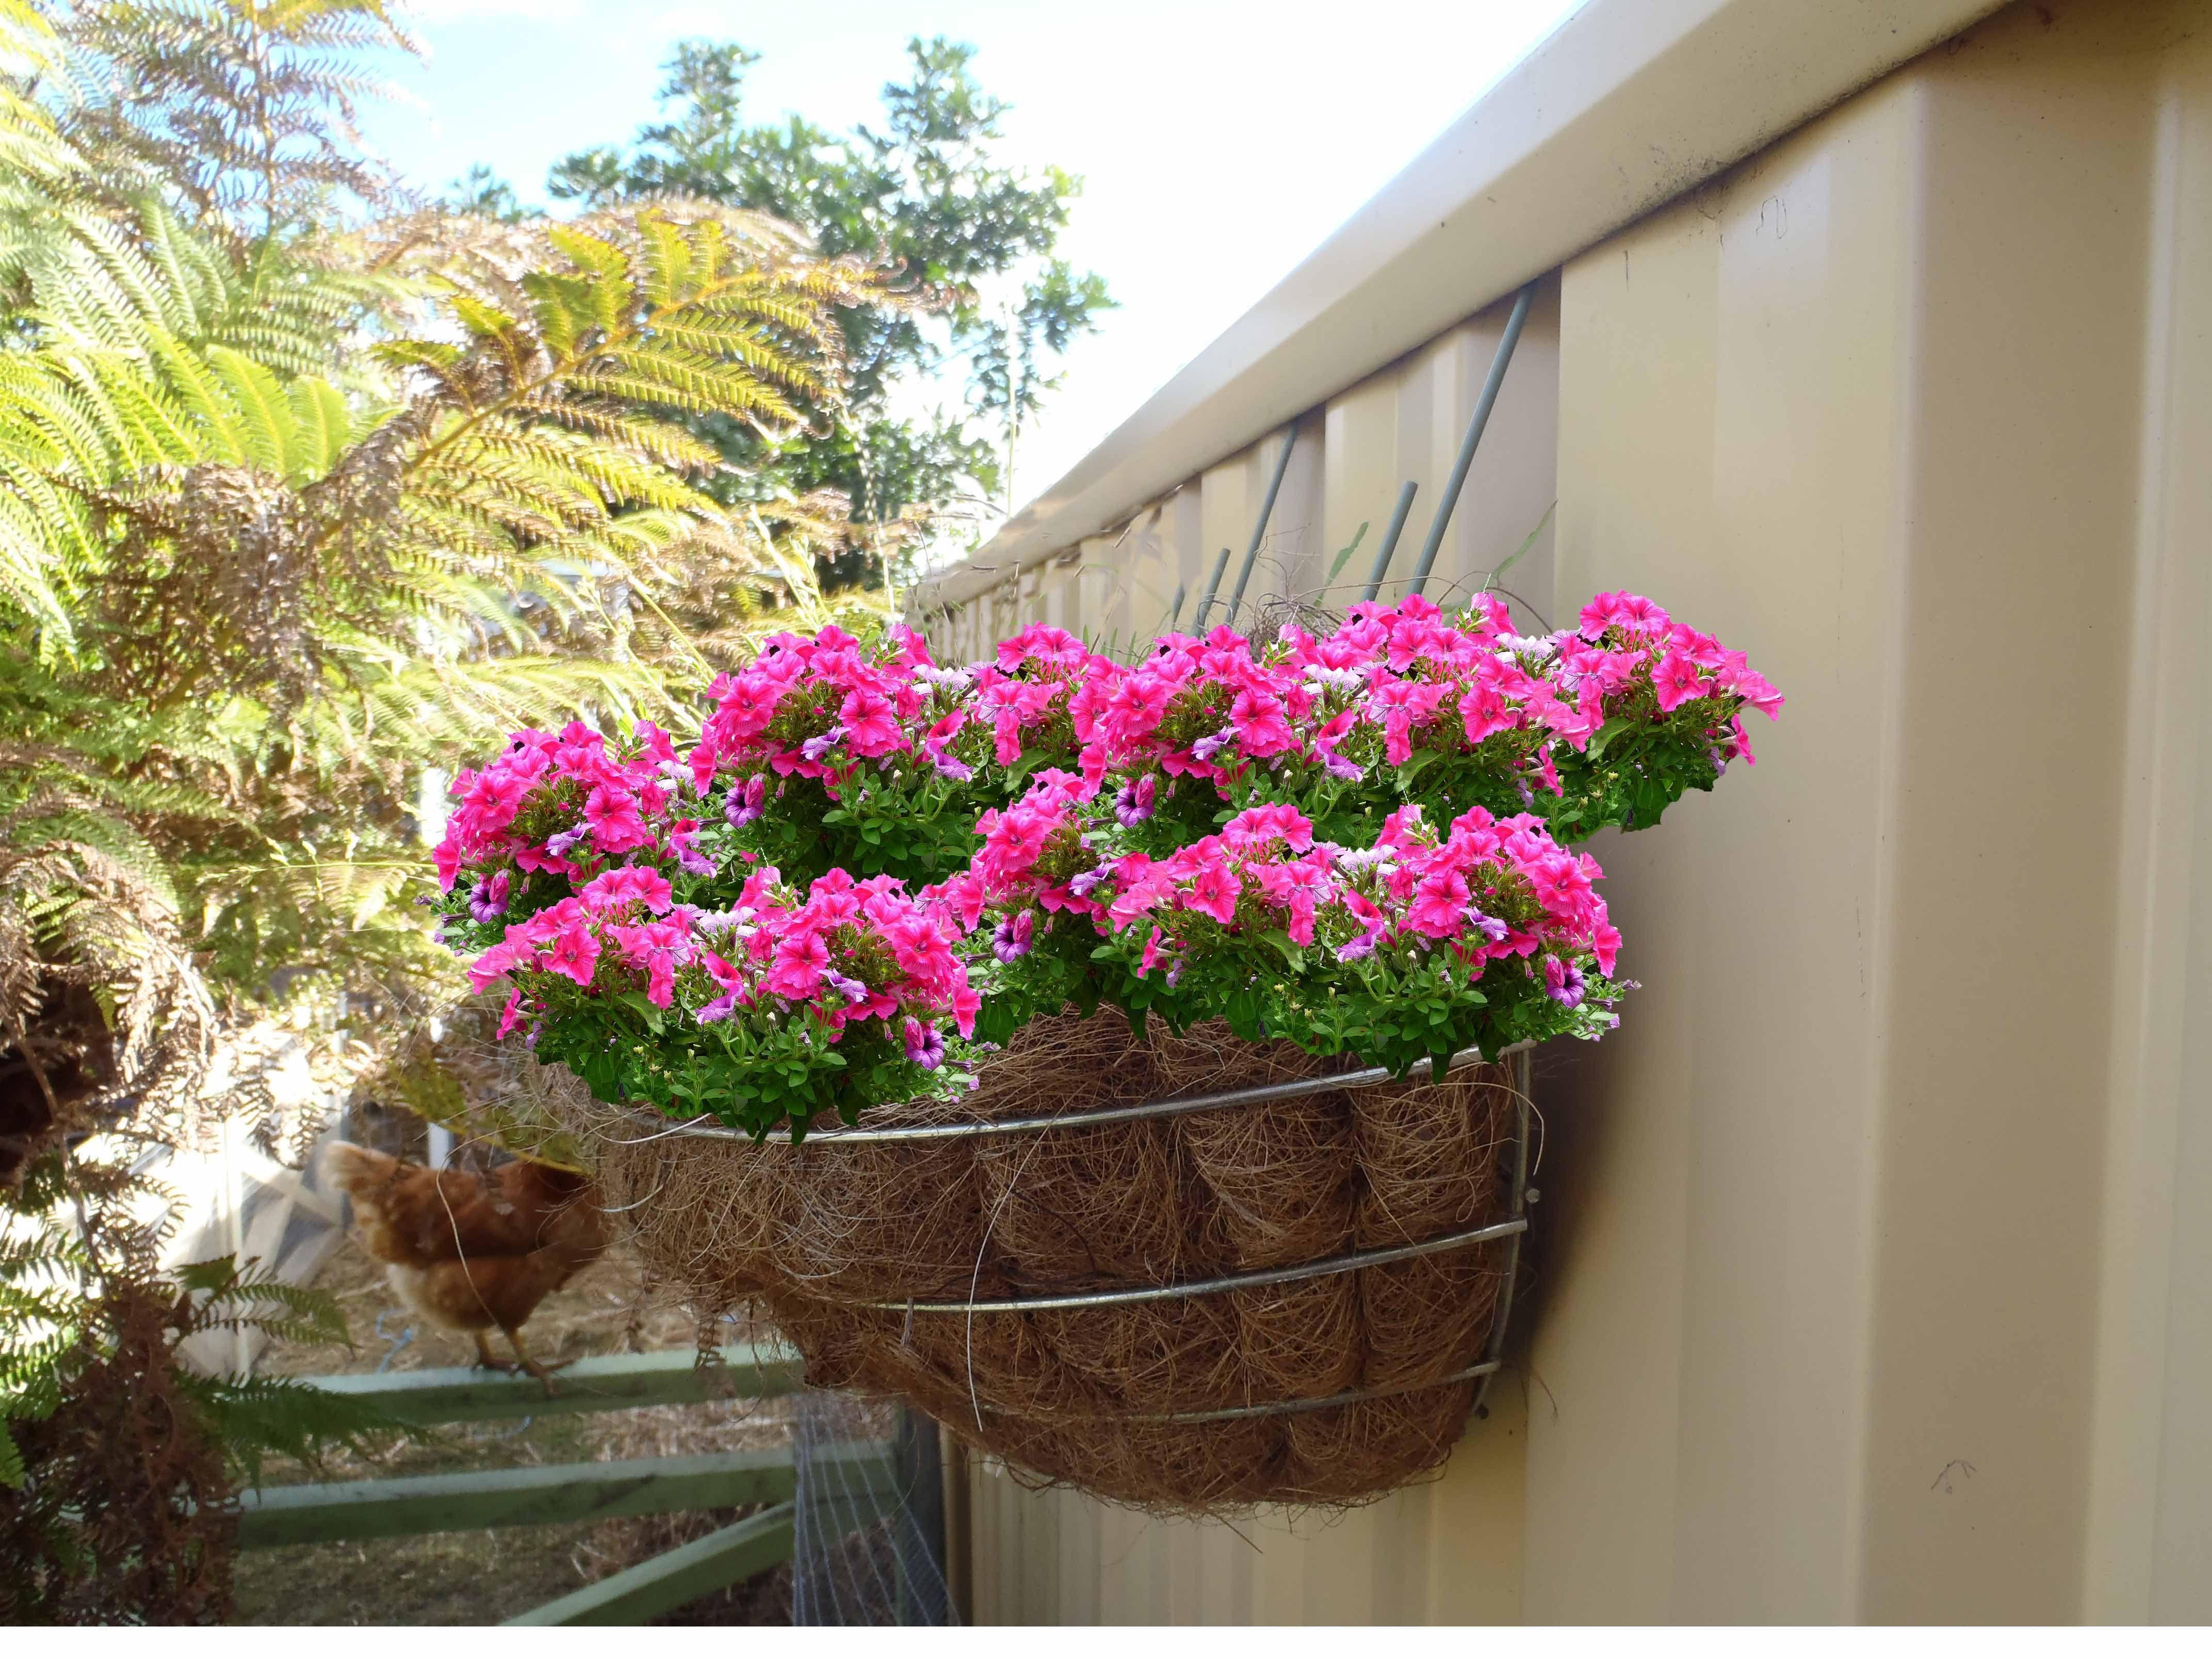 Flower Baskets On Fence : Hook a plant basket on colorbond? steel fencing with